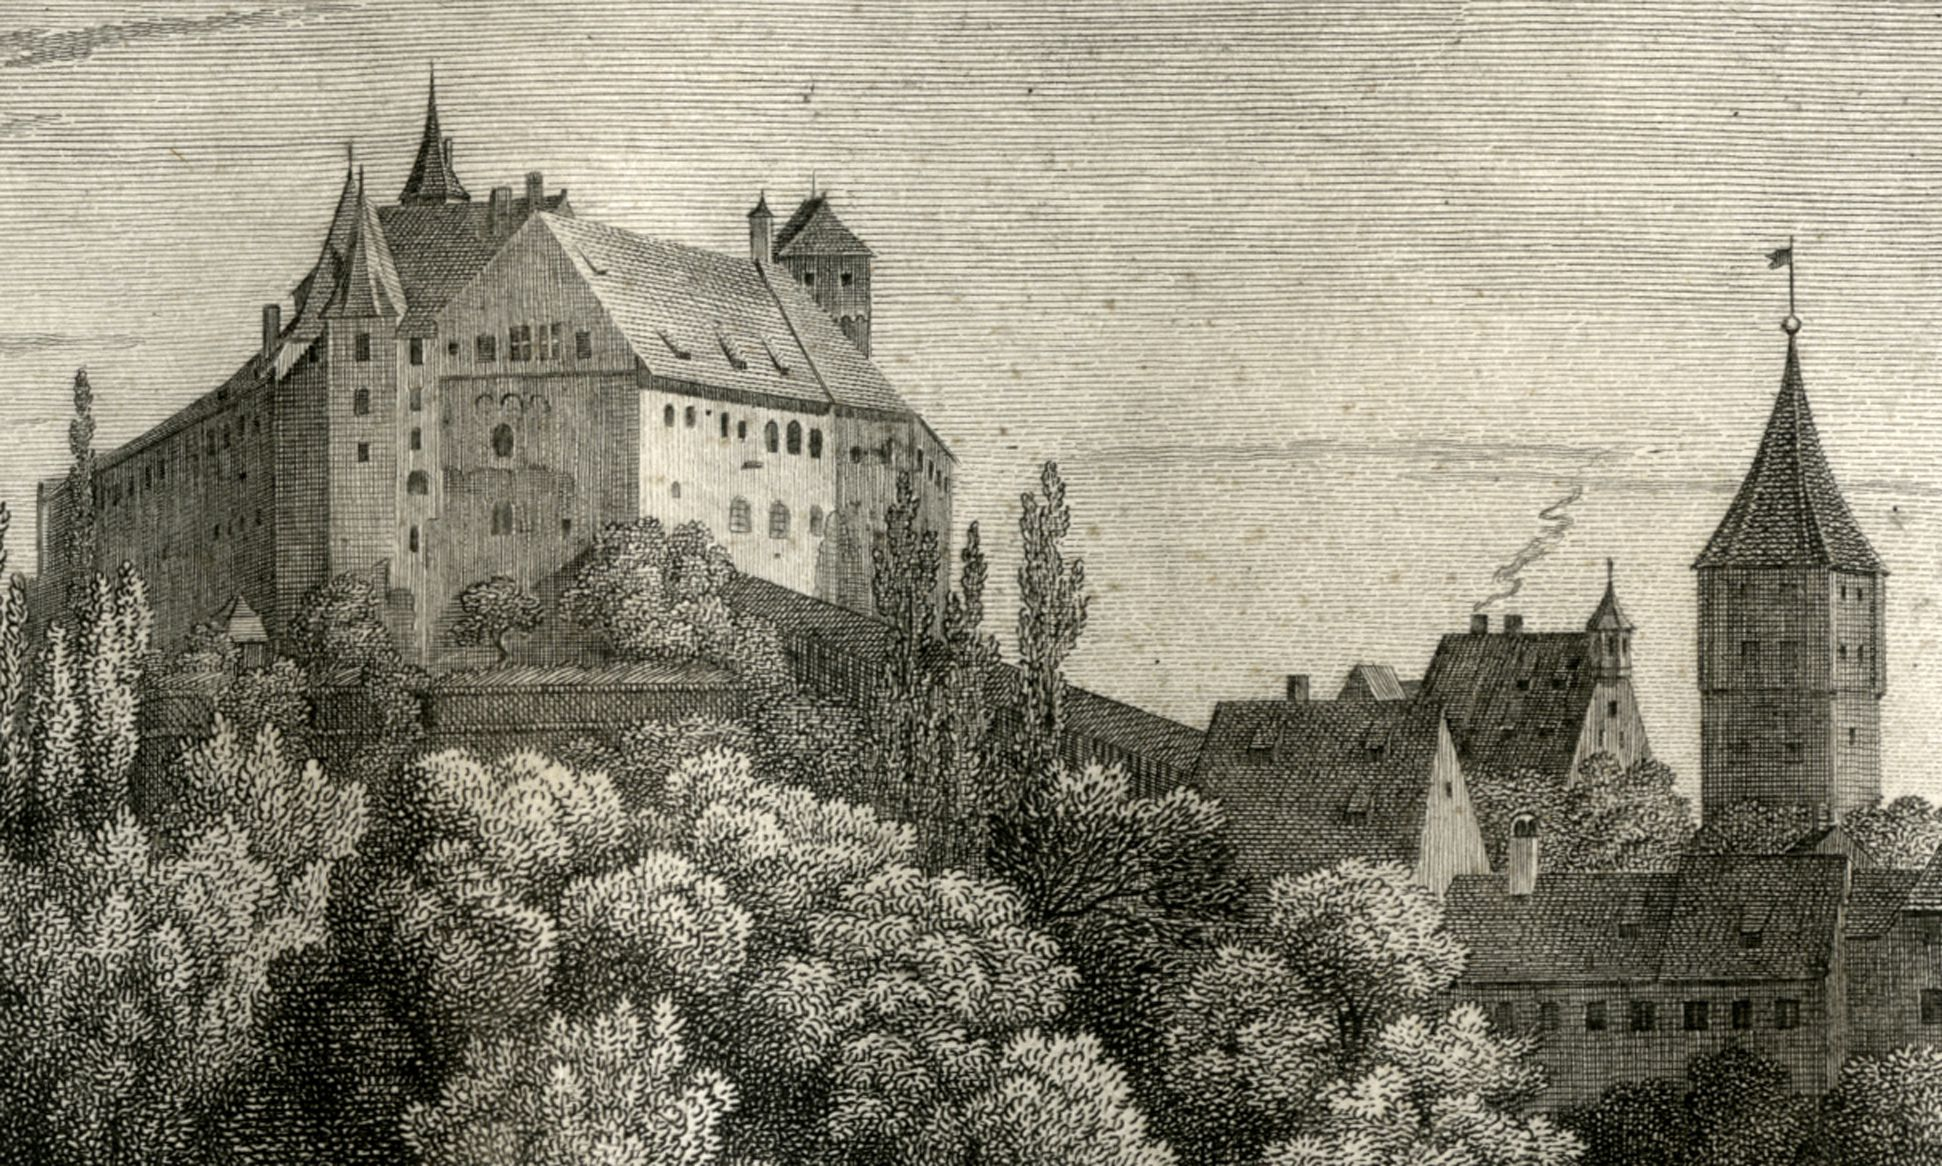 Ansicht der Burg zu Nürnberg Burg, Pilatushaus und Tiergärtnertorturm